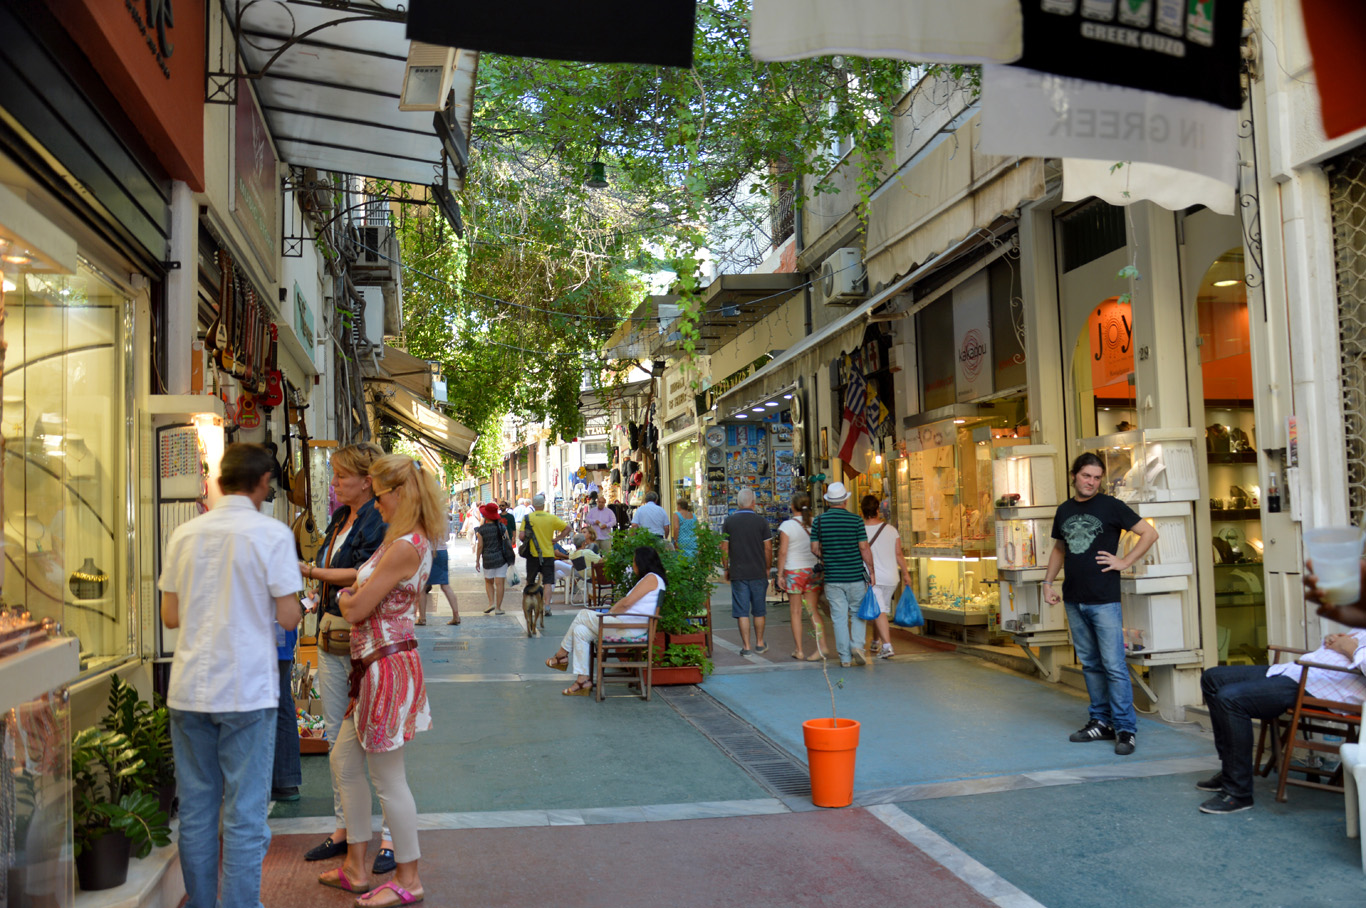 Streets in Plaka